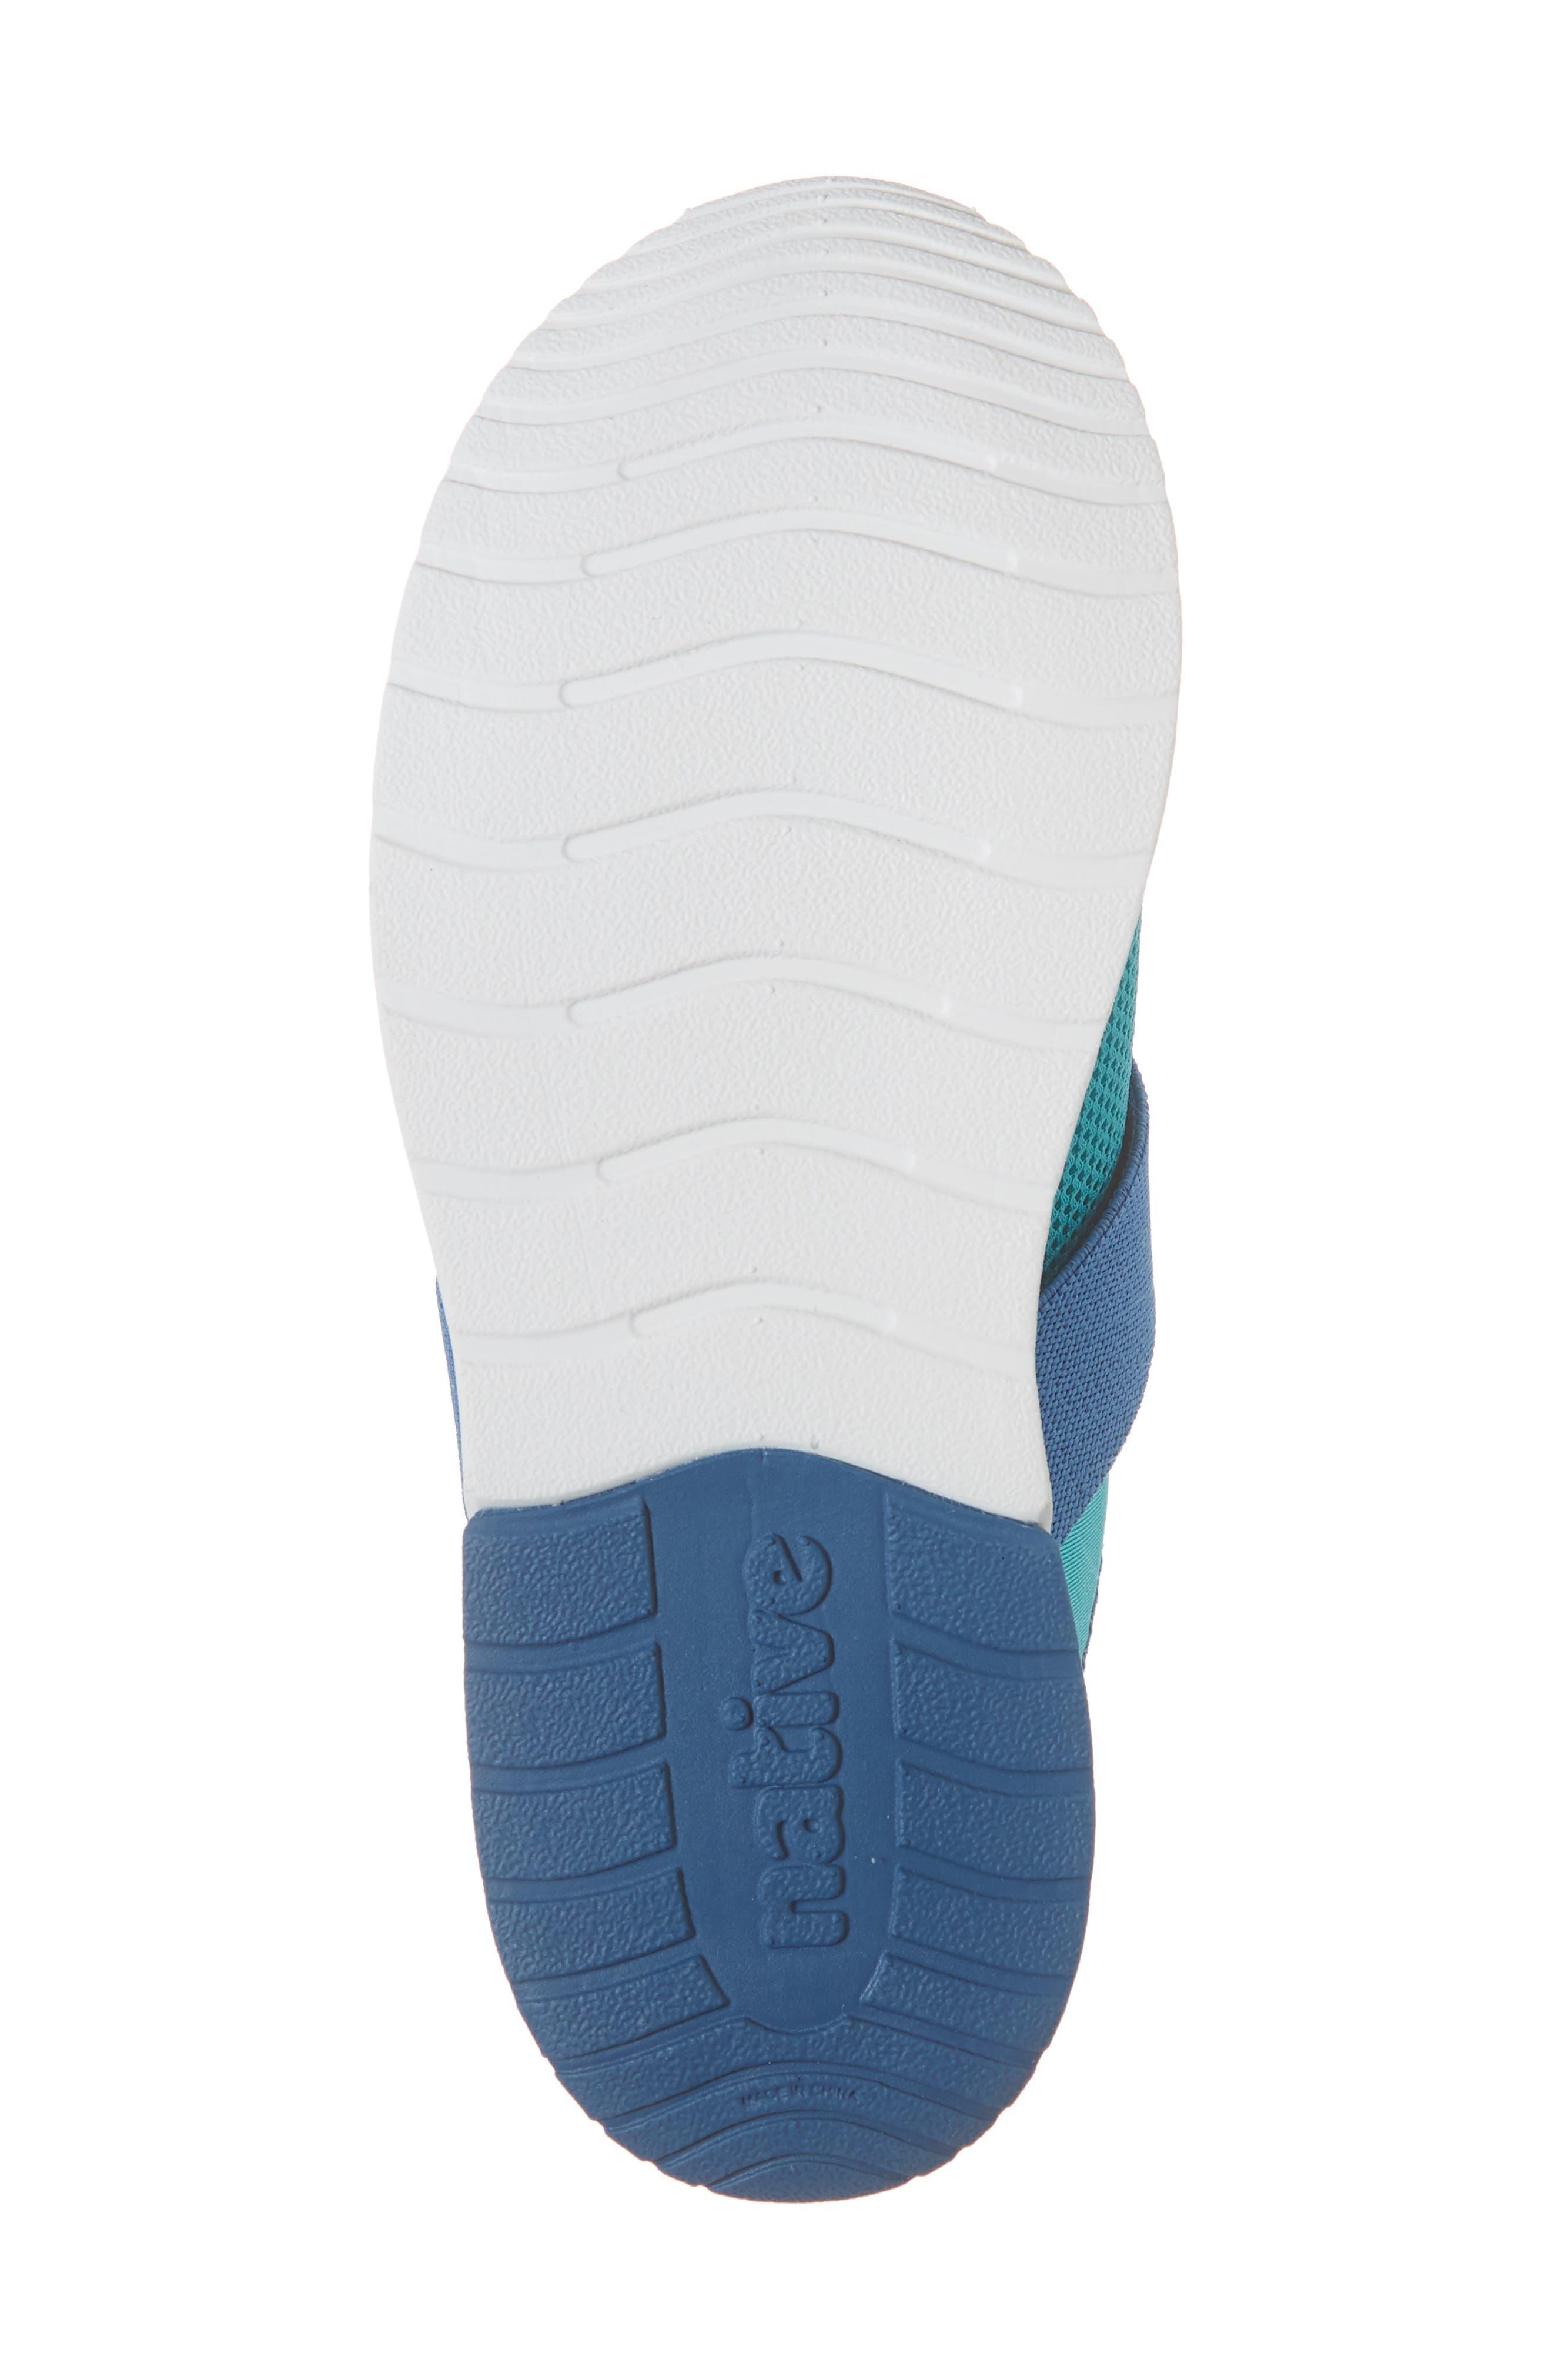 NATIVE SHOES,                             Phoenix Slip-On Vegan Sneaker,                             Alternate thumbnail 6, color,                             GLACIER GREEN/ BLUE/ WHITE